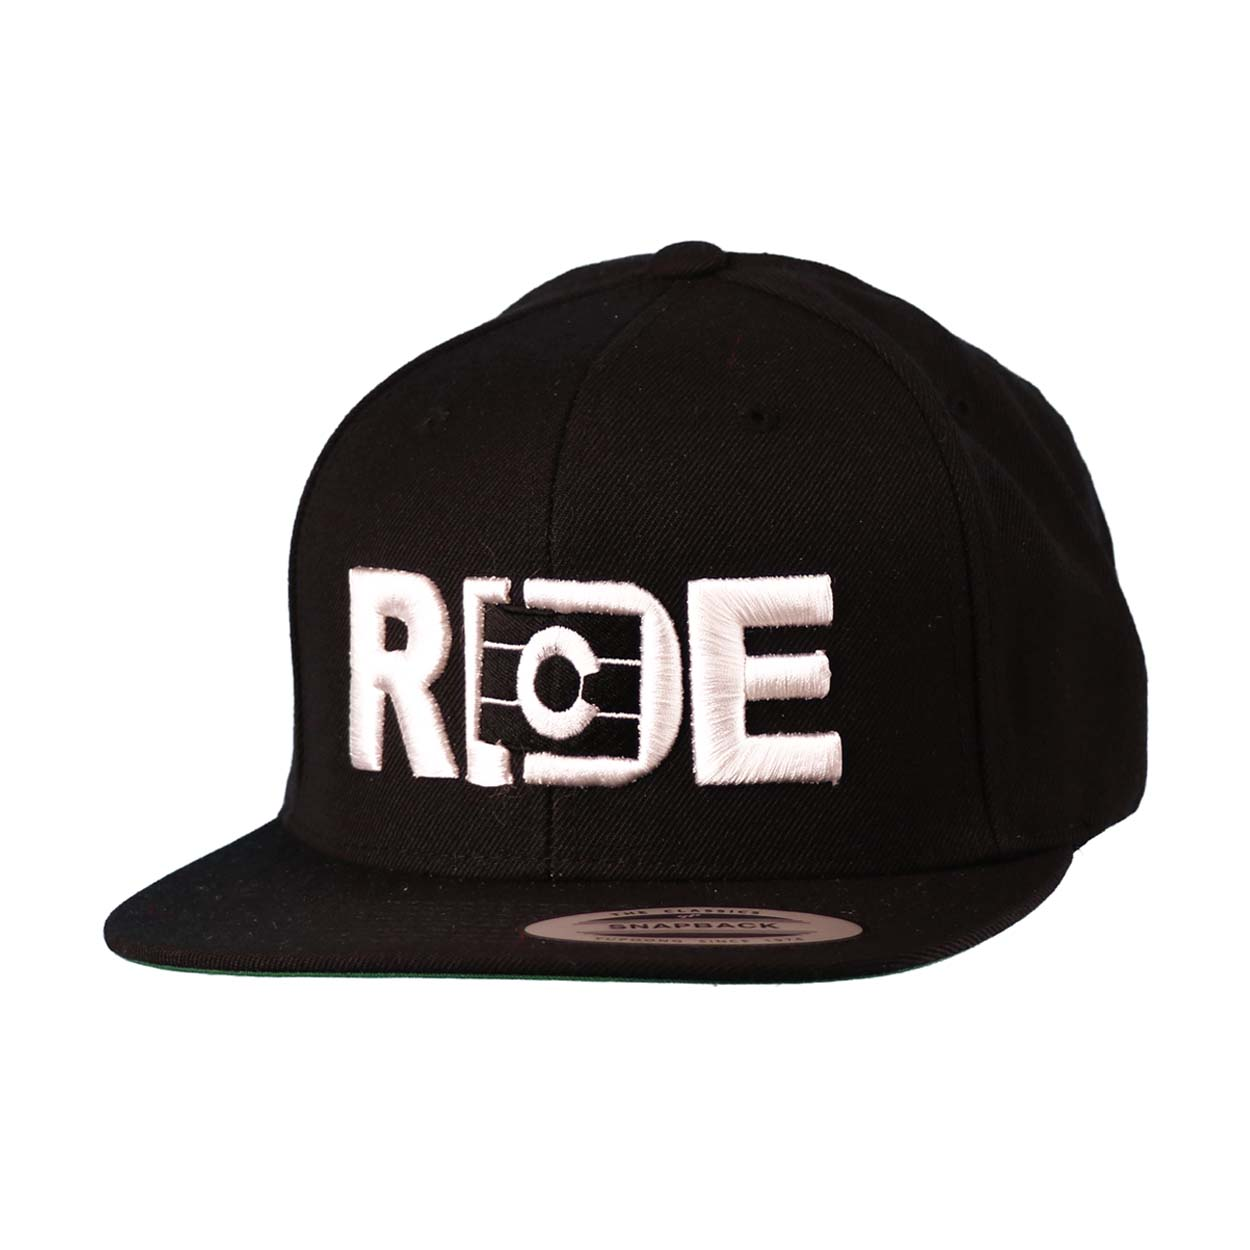 Ride Colorado Classic Embroidered  Snapback Flat Brim Hat Black/White